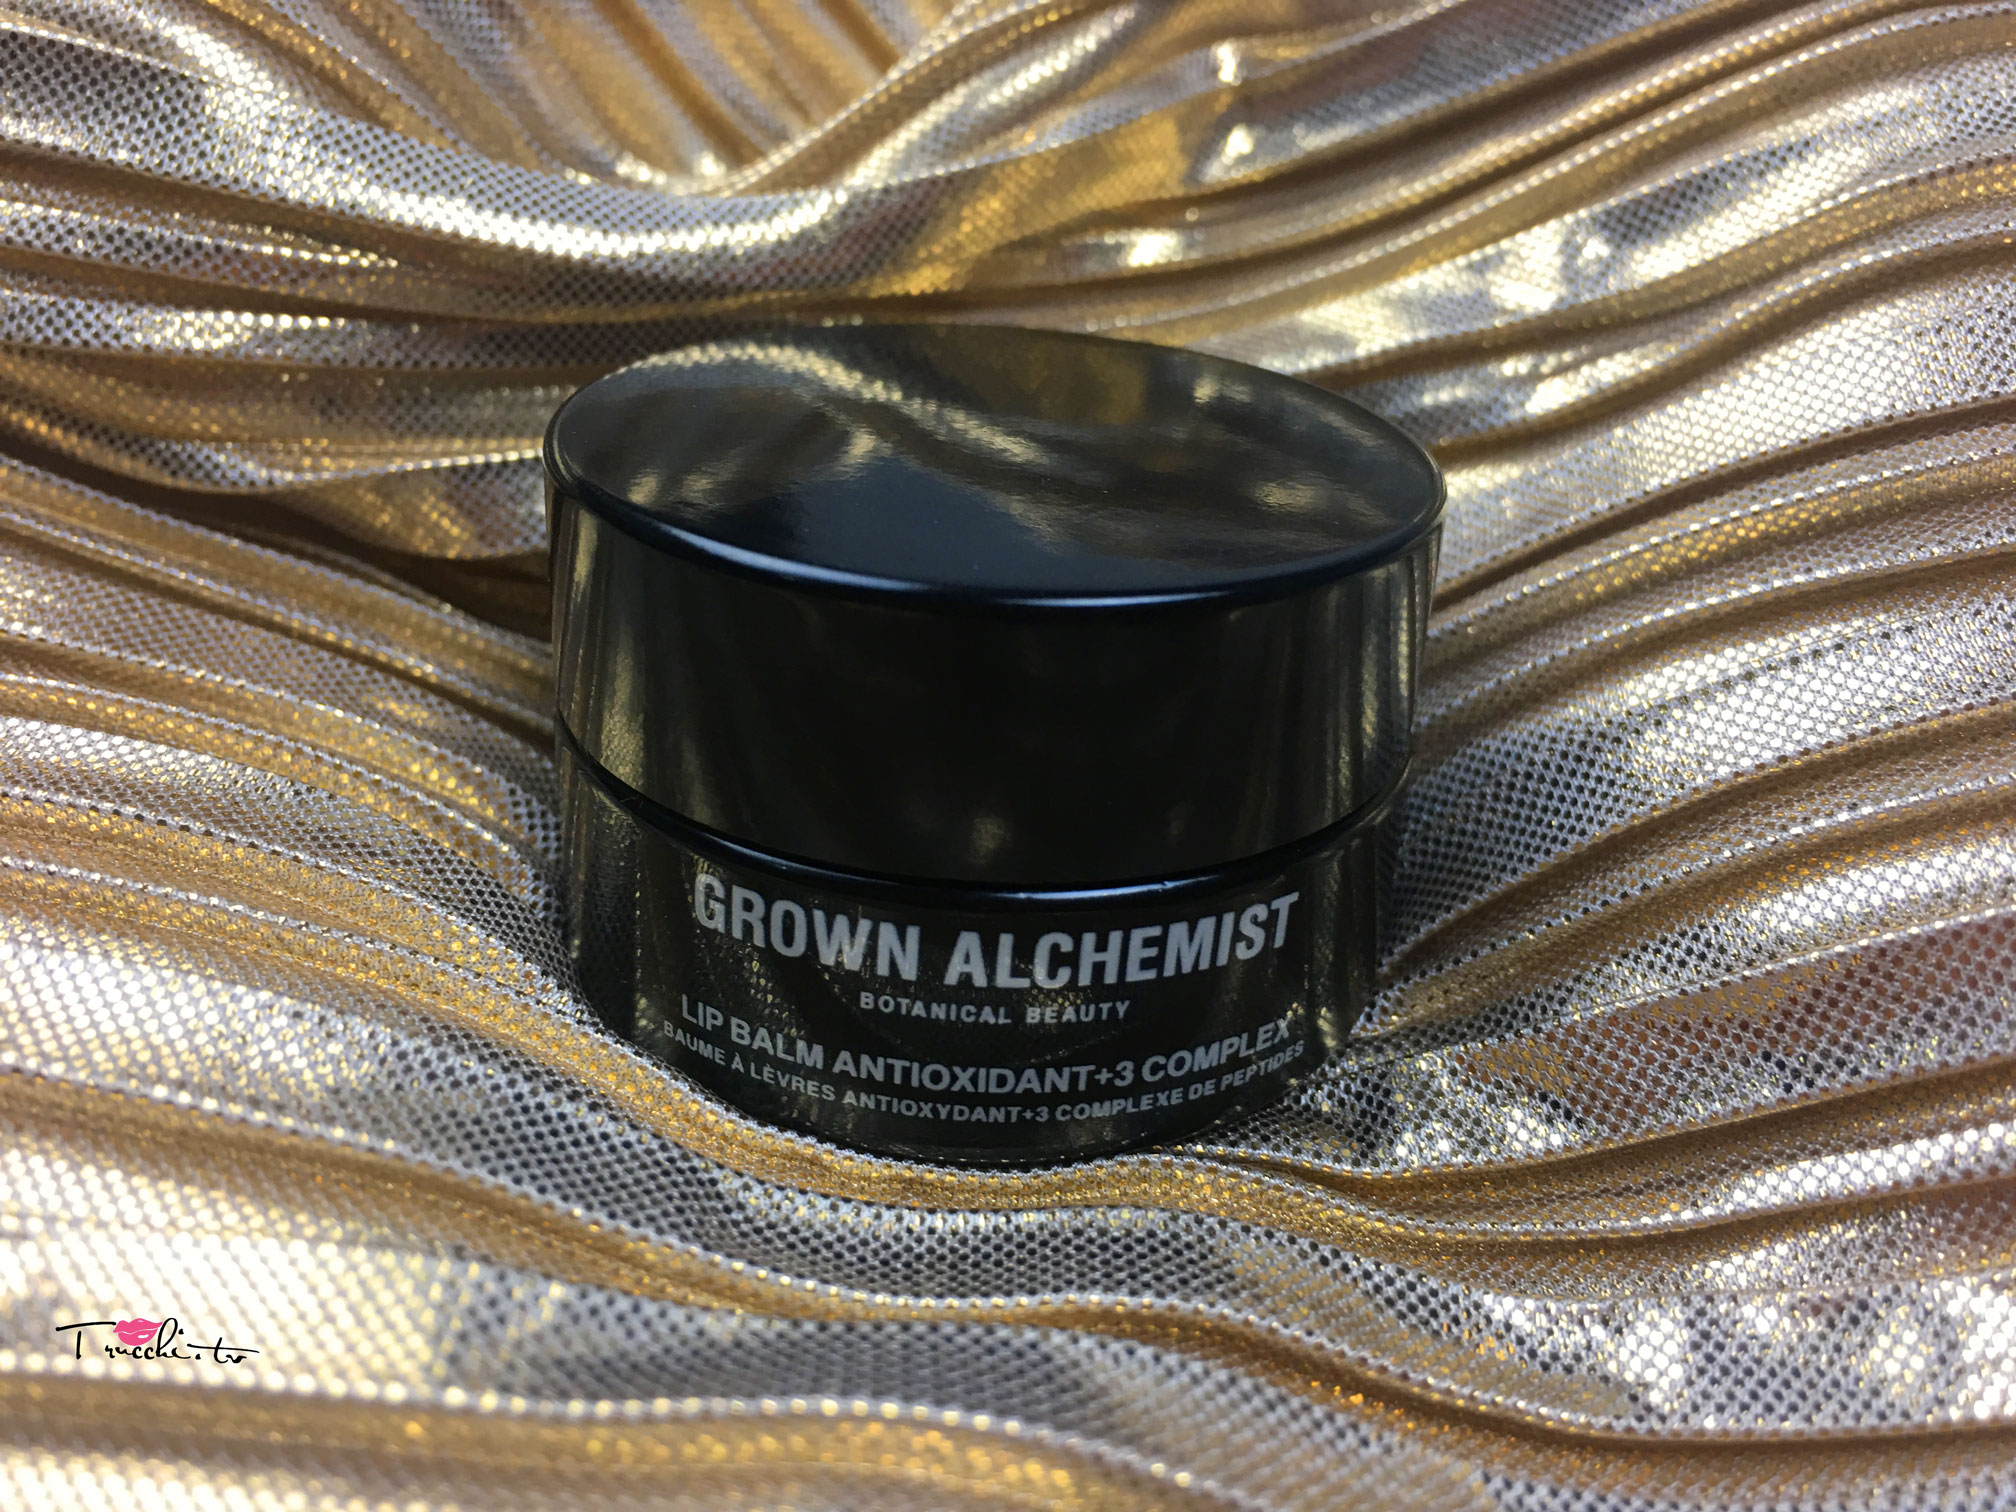 Grown Alchemist Lip Balm Antioxidant +3 Complex